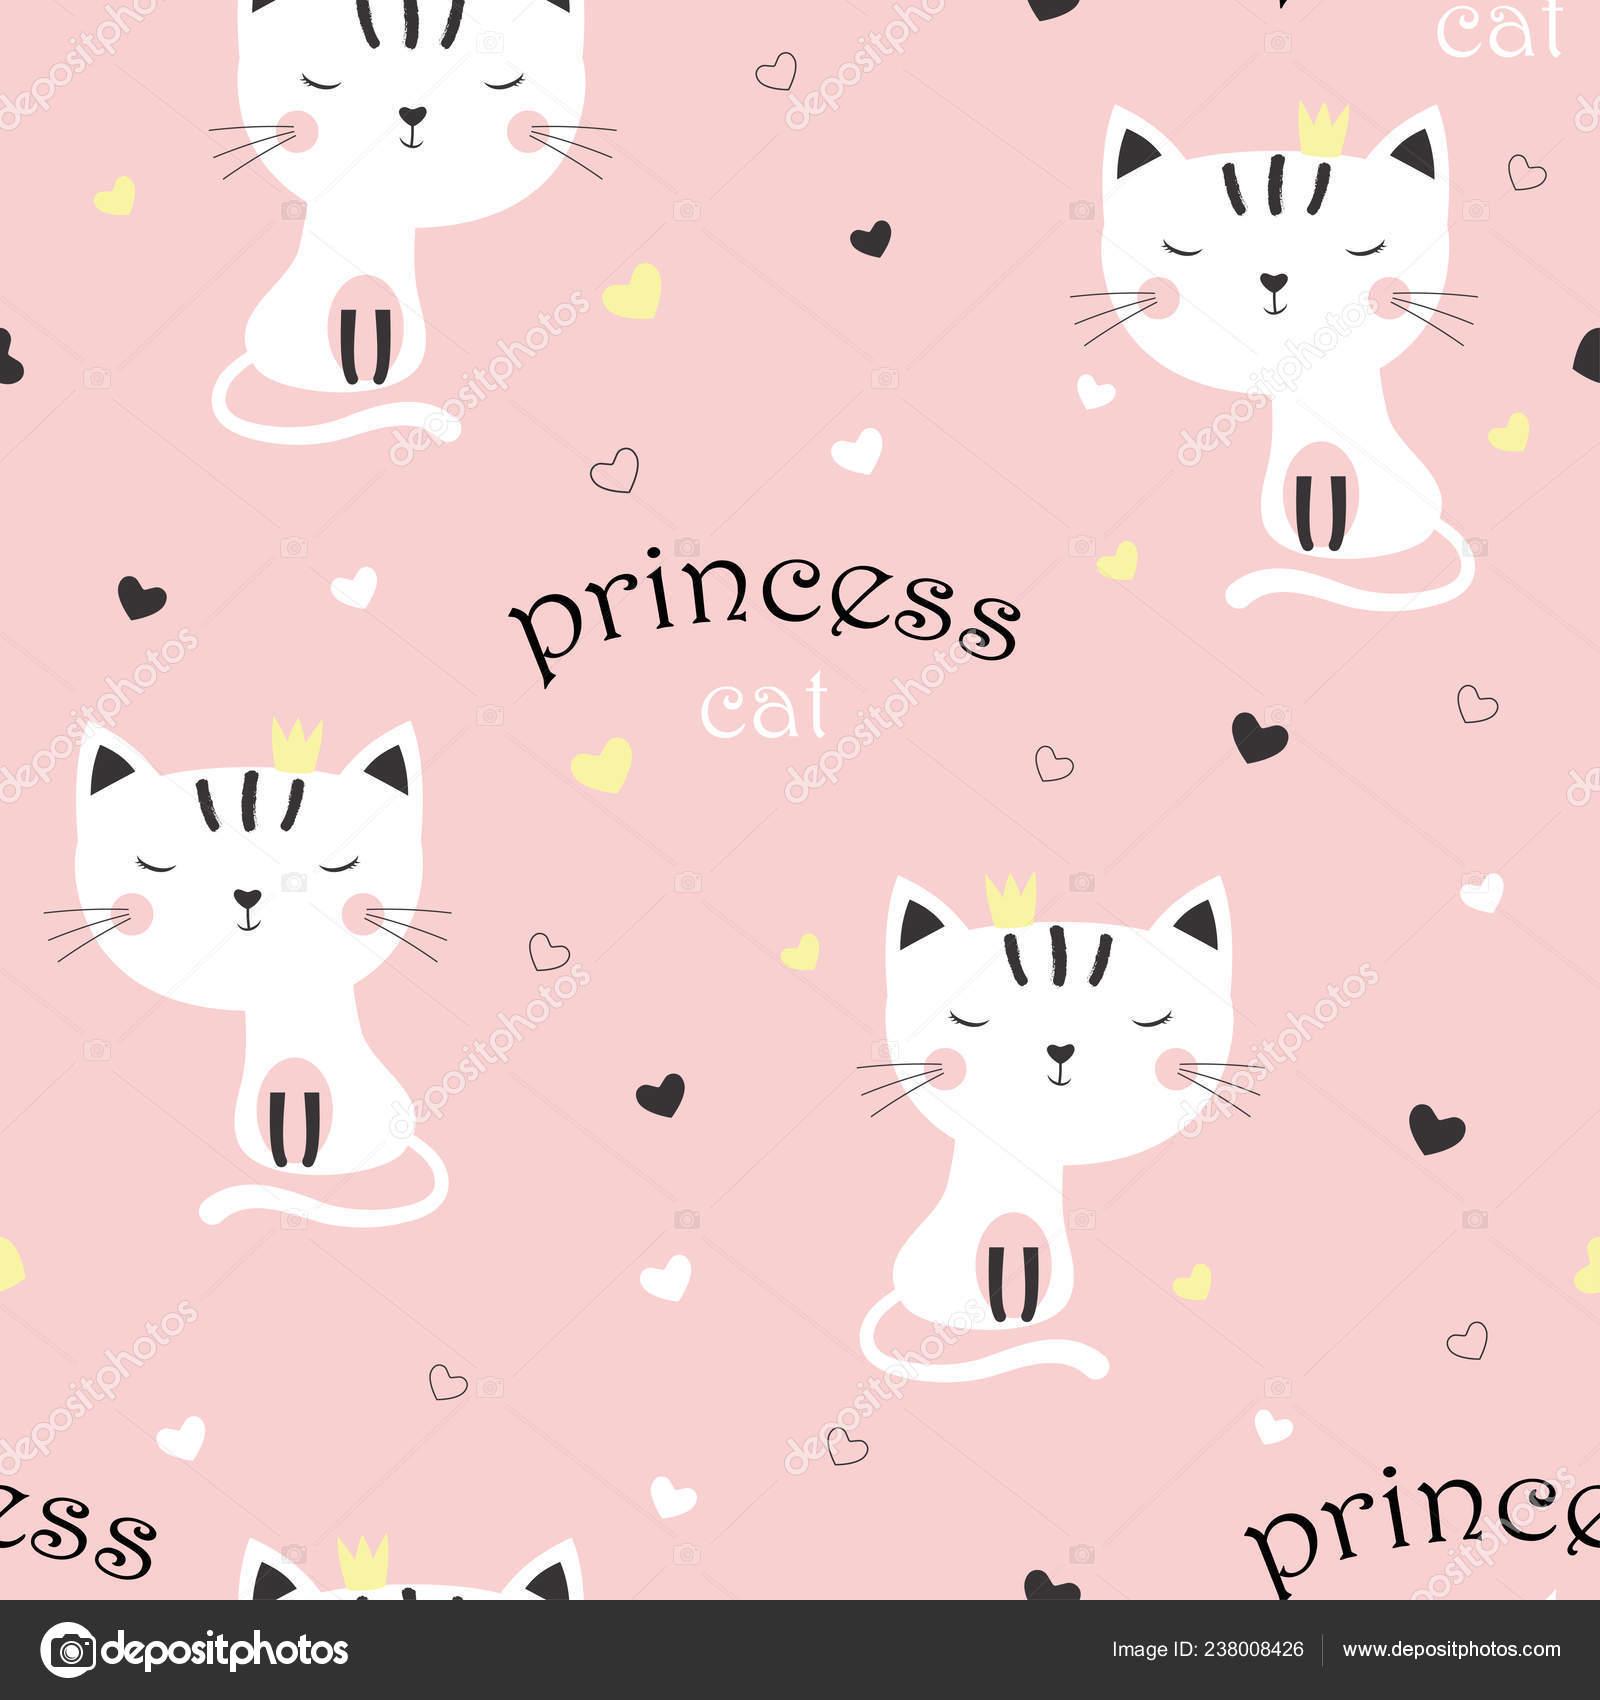 Cartoon Image Of Sweet Cat Pattern Cartoon Sweet Cat Girl Crown Pink Background Multicolor Hearts Stock Vector C Makc76 238008426